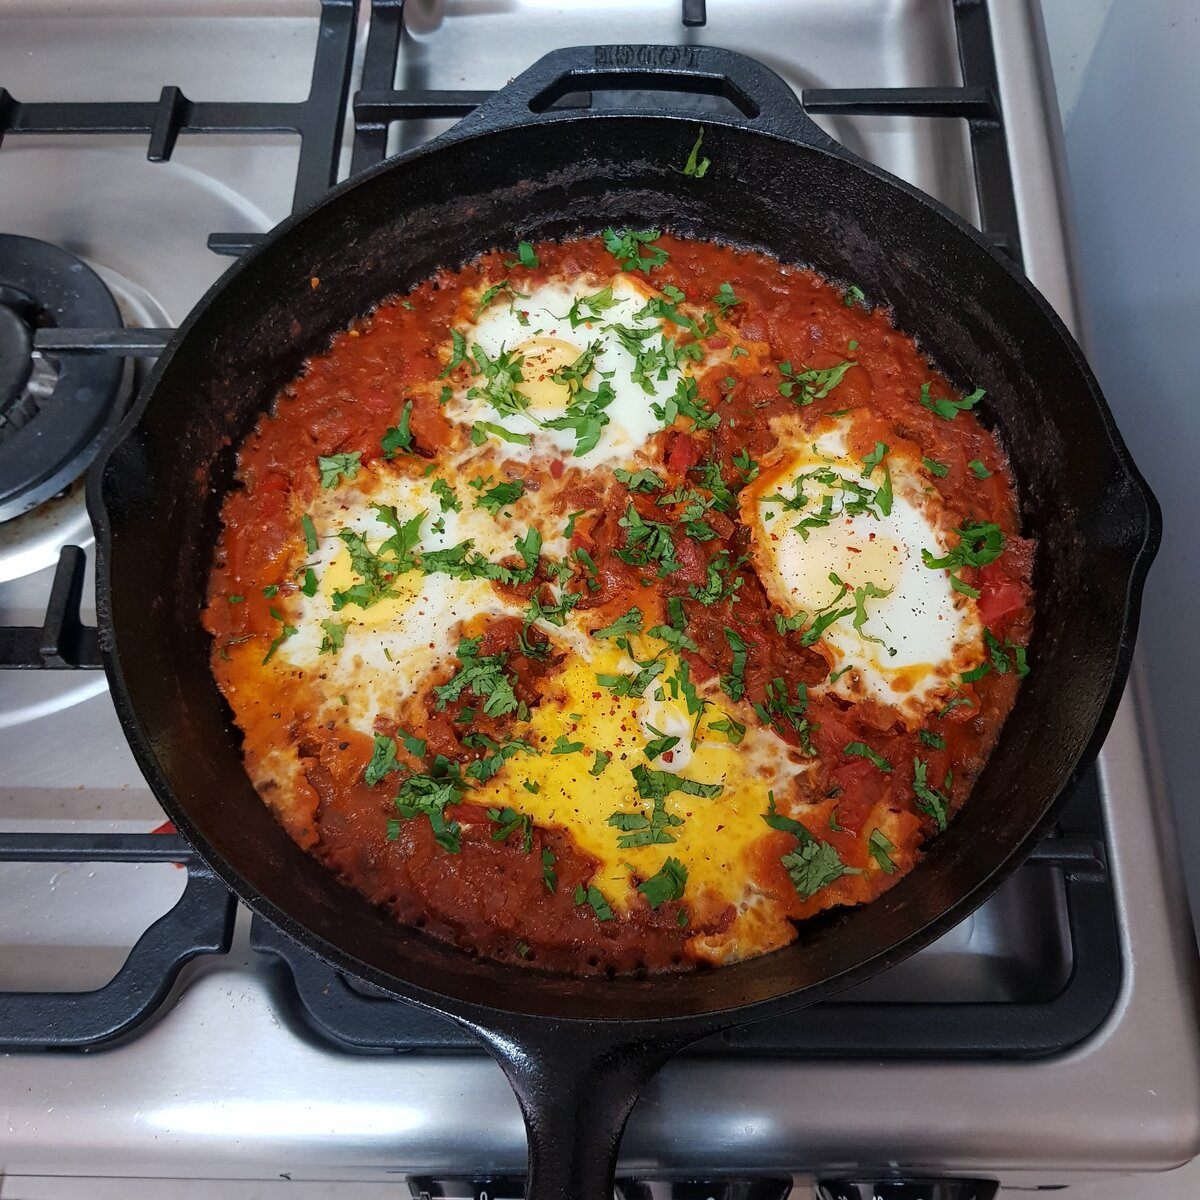 My roommate's favorite egg dish: Shakshuka